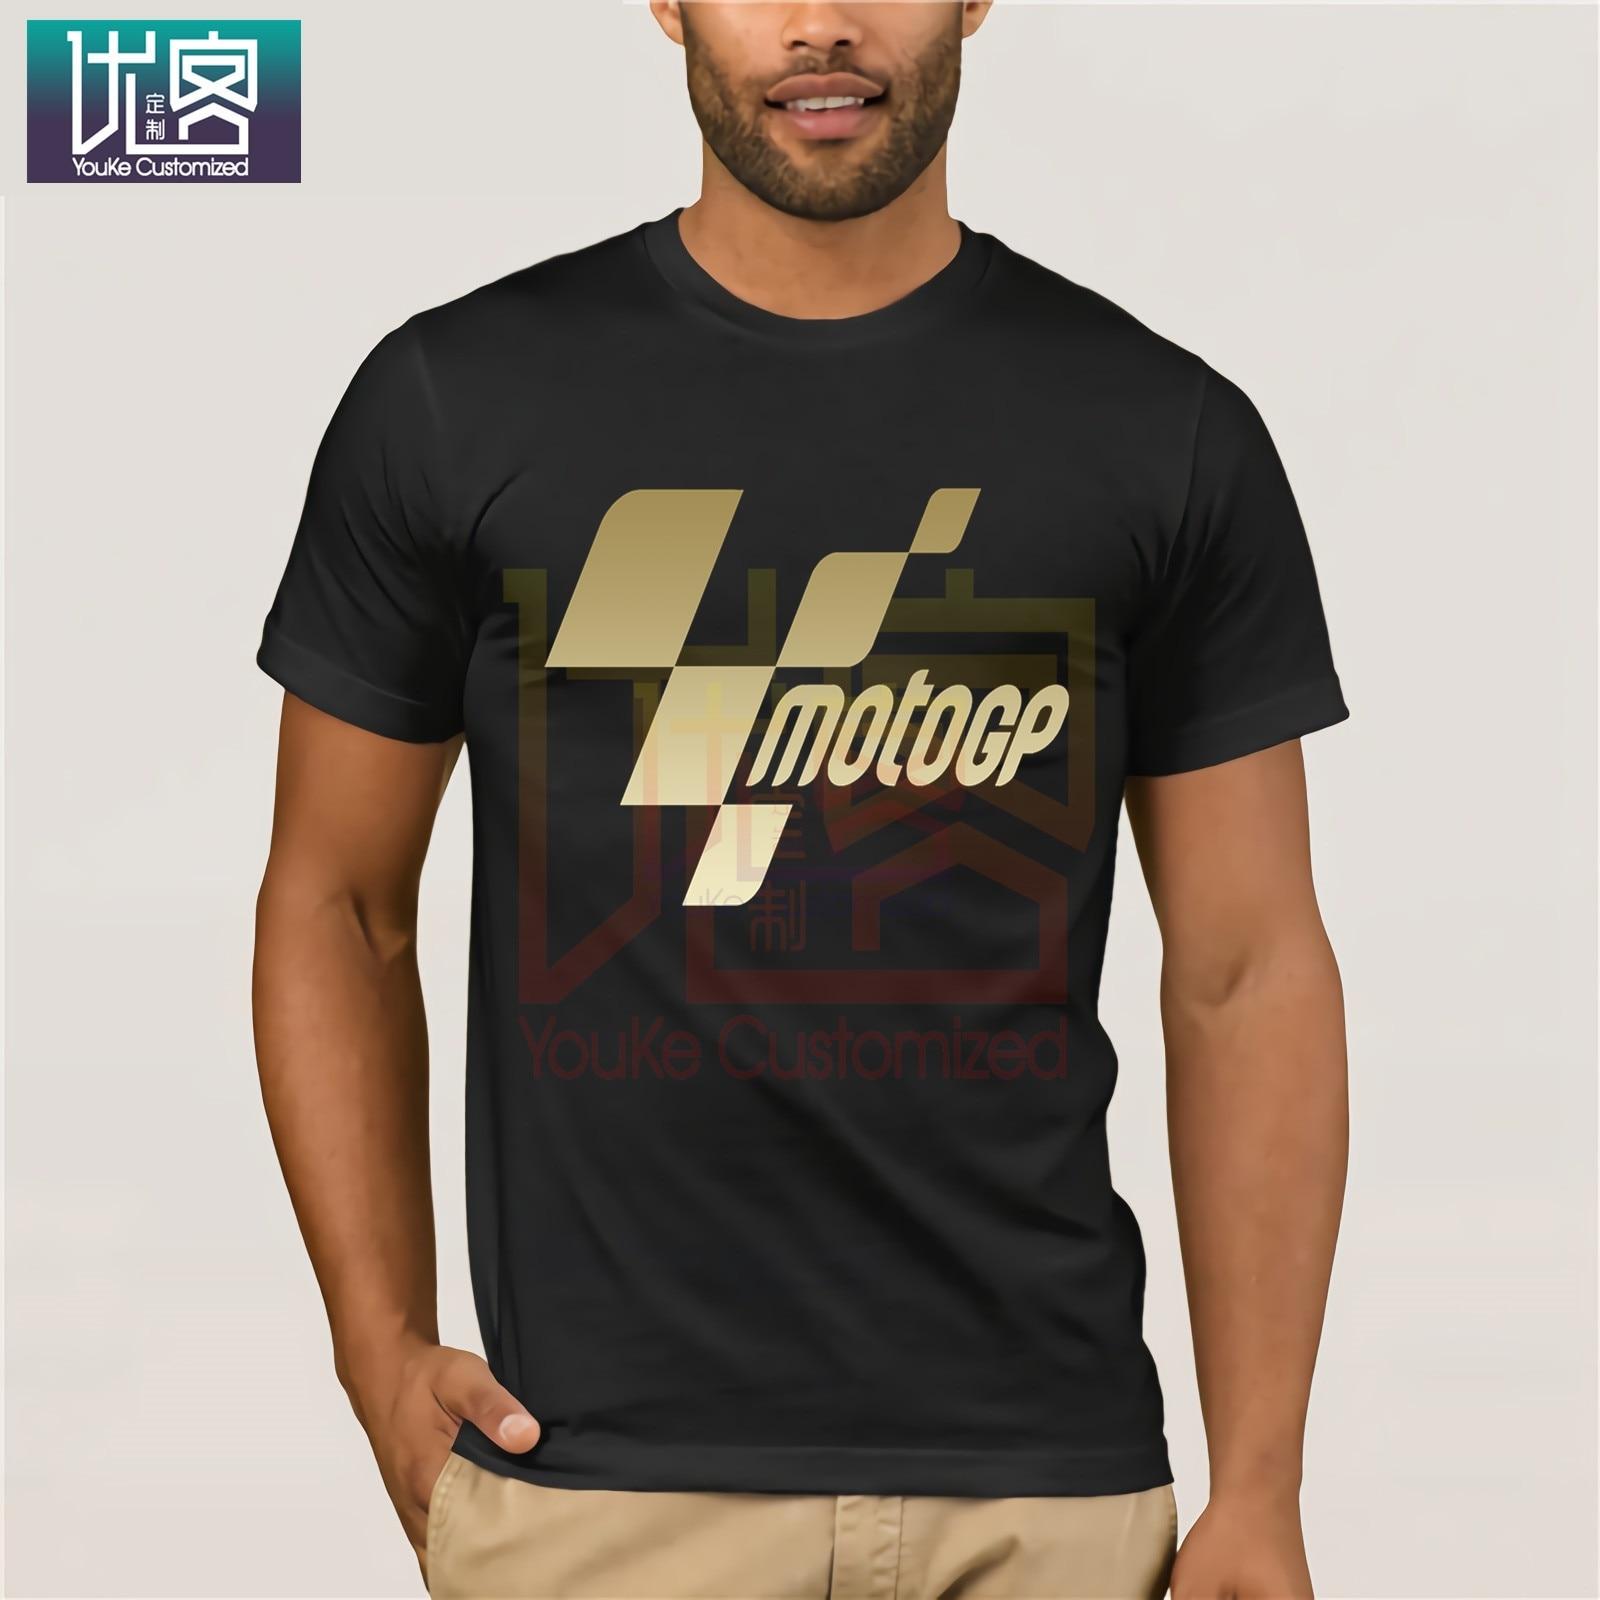 Moto Gp Logo 2019 Shirt Rossi Moto Gp Logo Shirt For Team 46 Mens The Doctor Black White T-Shirt Motocycle Vintage Crew Neck